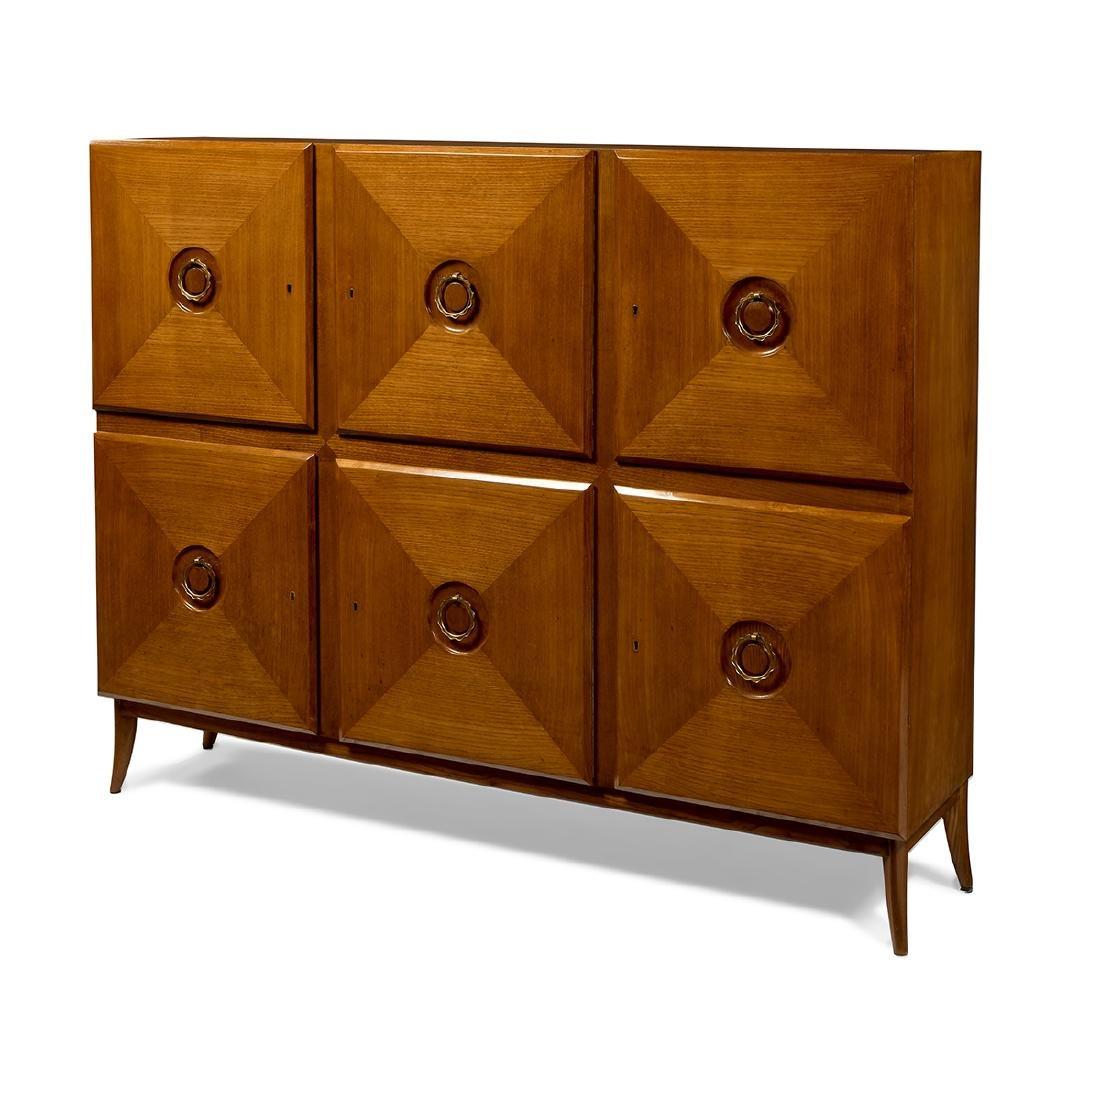 Paolo Buffa cabinet / sideboard